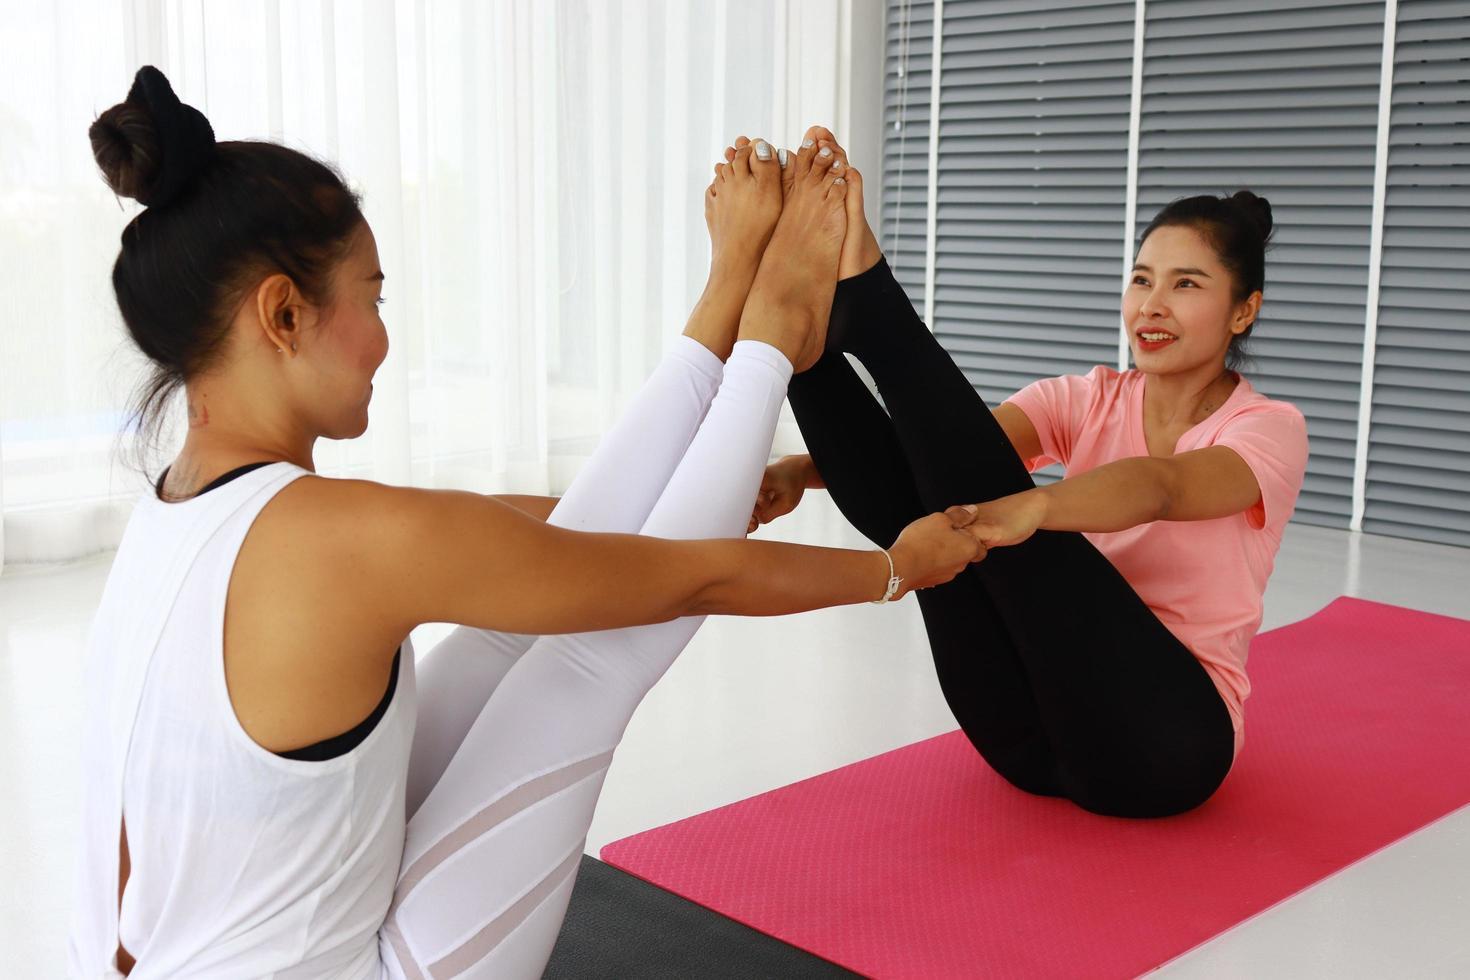 vrouwen die samen yoga beoefenen foto